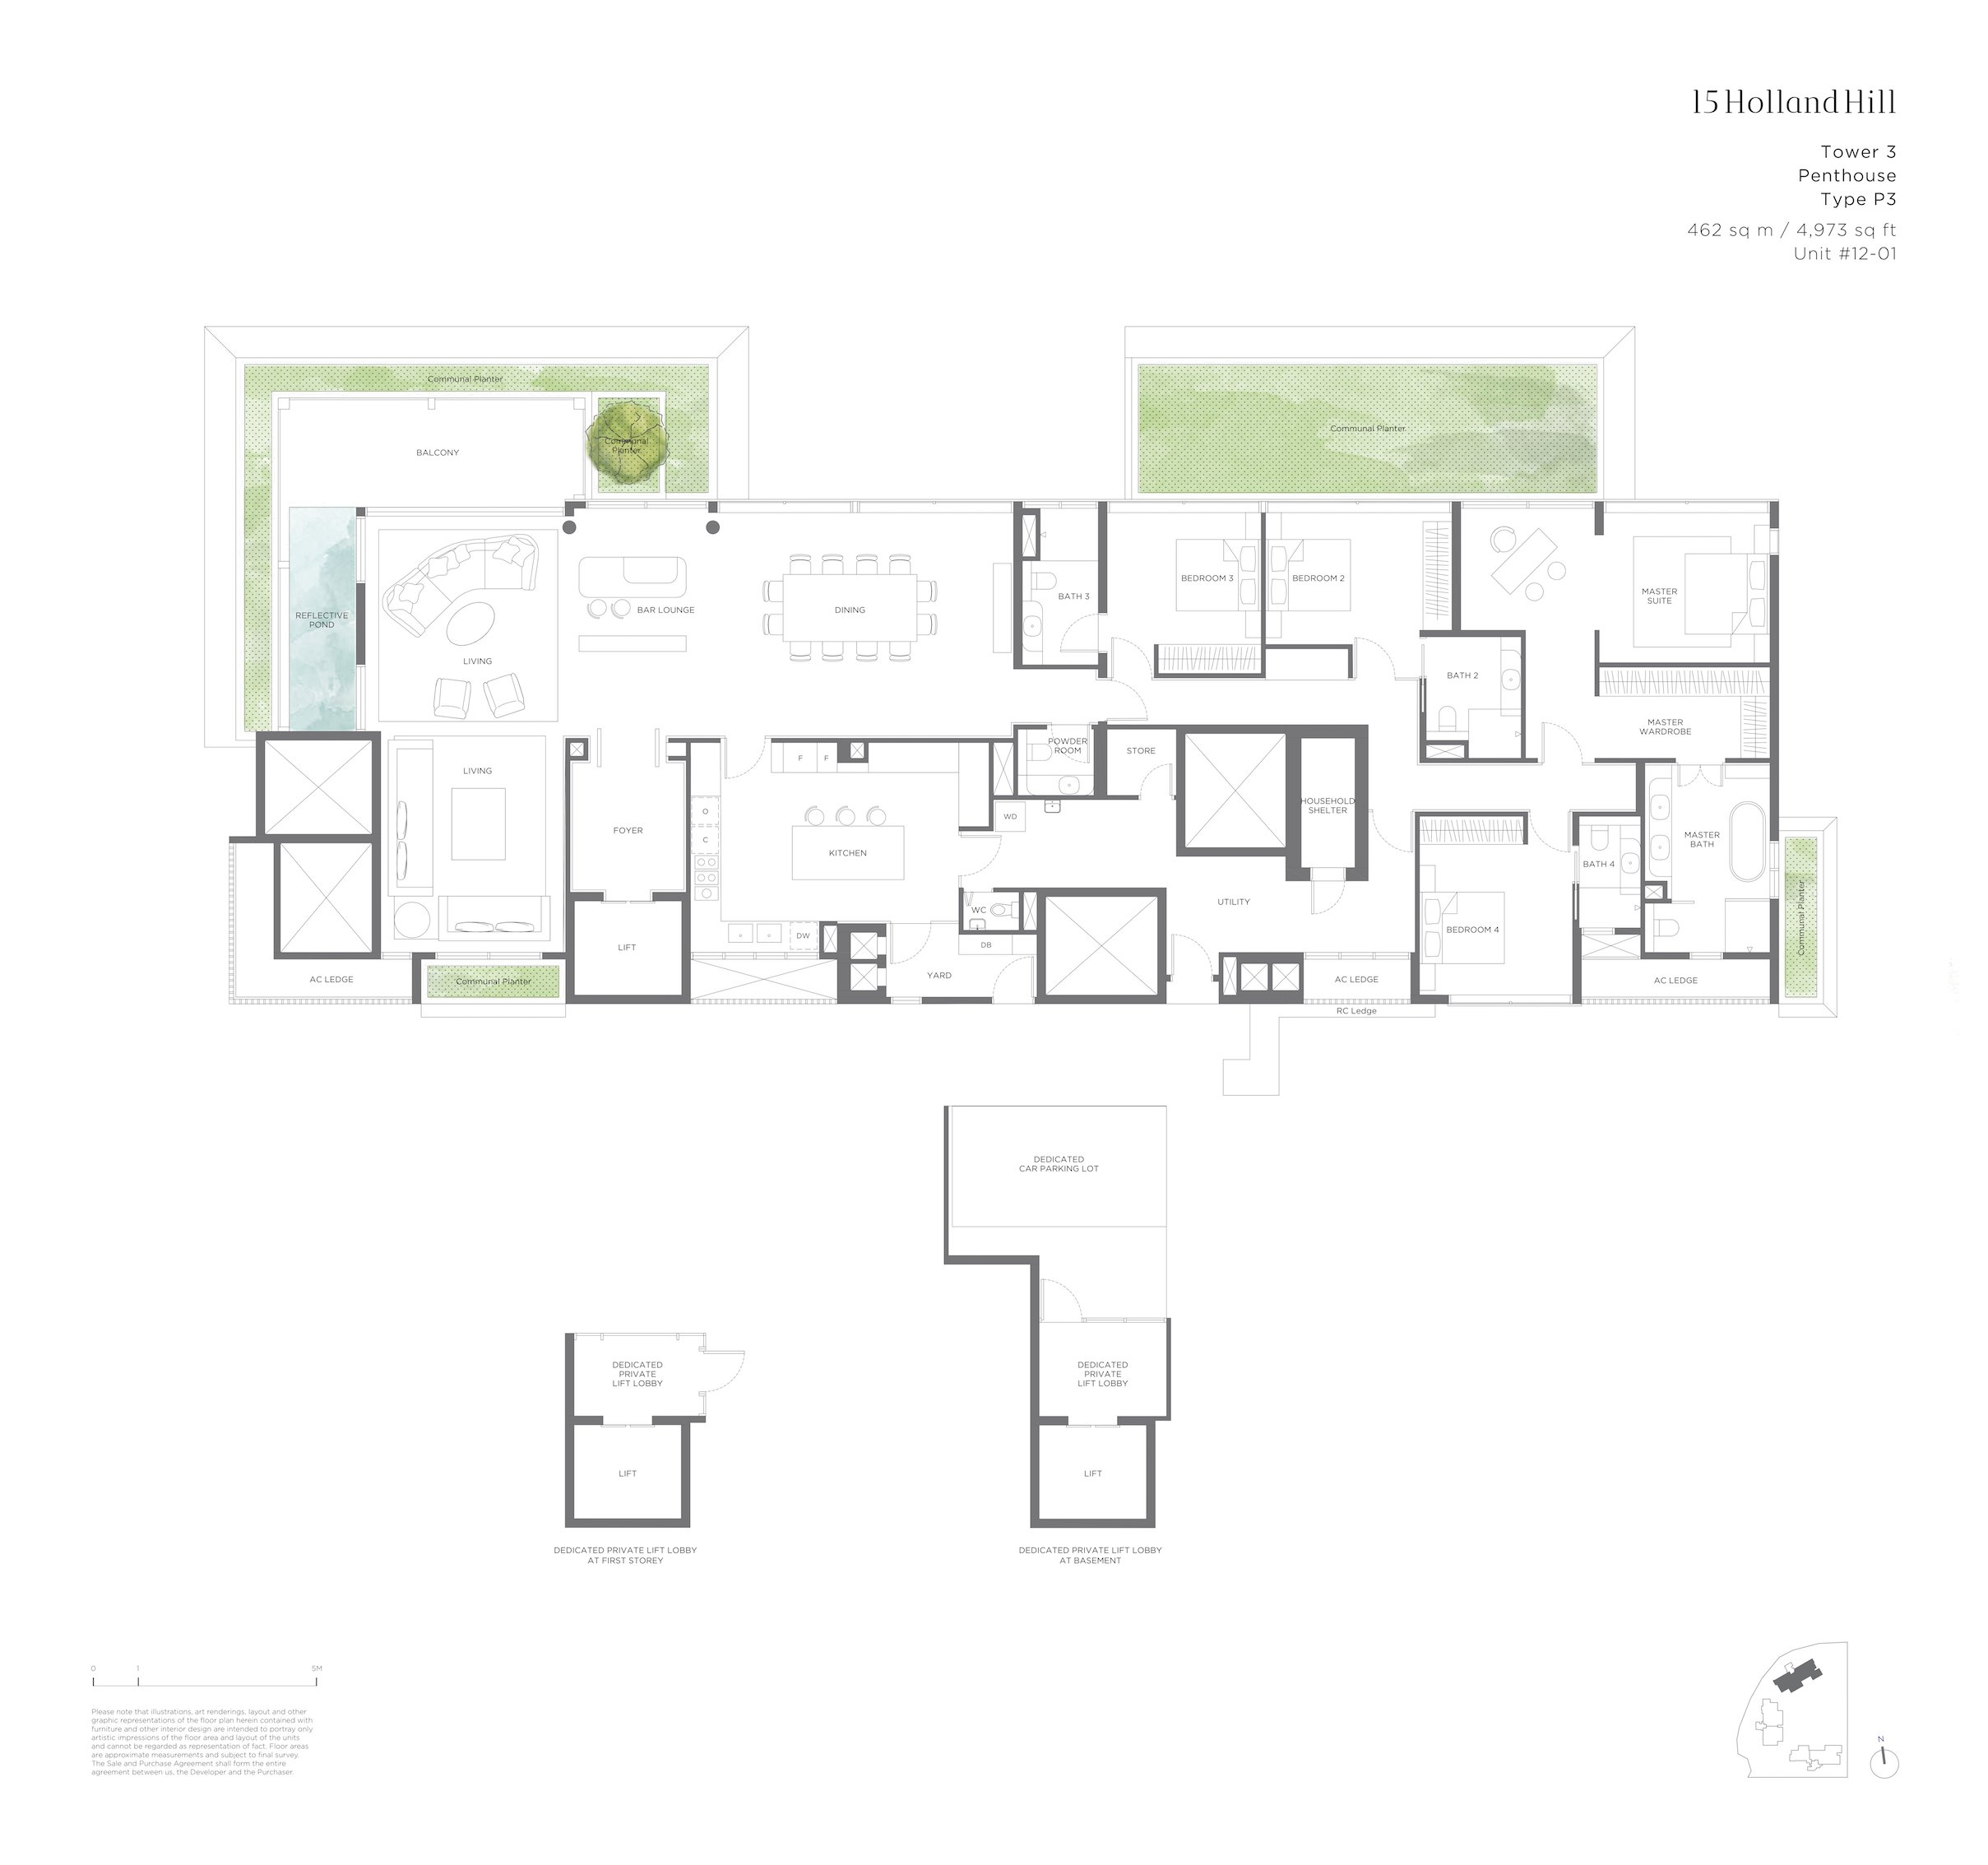 15 Holland Hill 荷兰山公寓 4-bedroom Penthouse p3